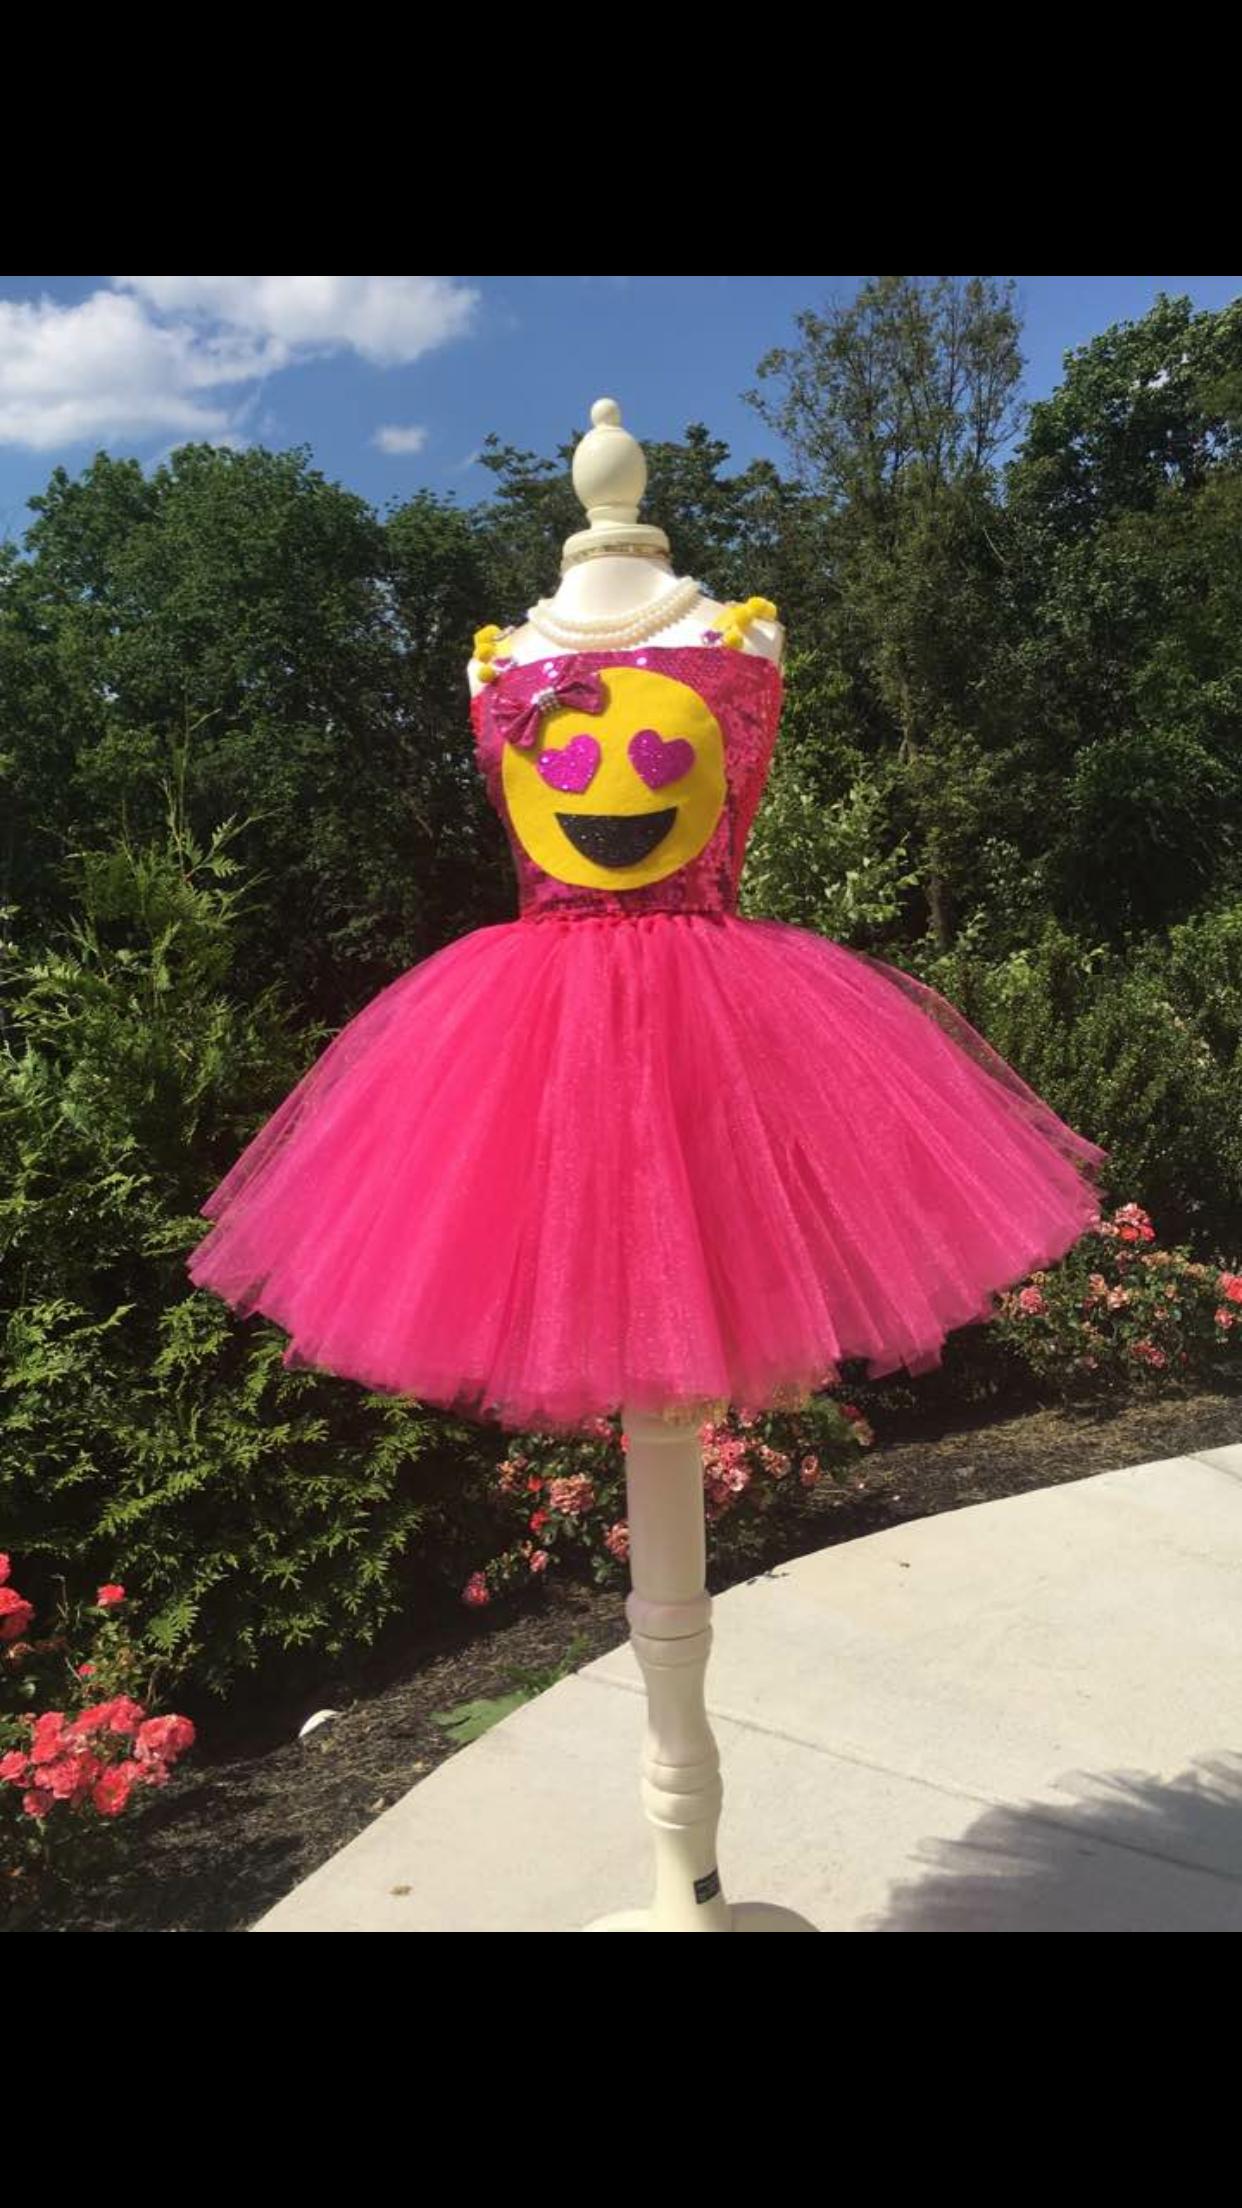 Heart Eyes Emoji Pink Dress All Sizes Any Color Etsy Com Tutugenie Emoji Hearteyesemoji Emoj Emoji Halloween Costume Tutu Outfits Halloween Costumes